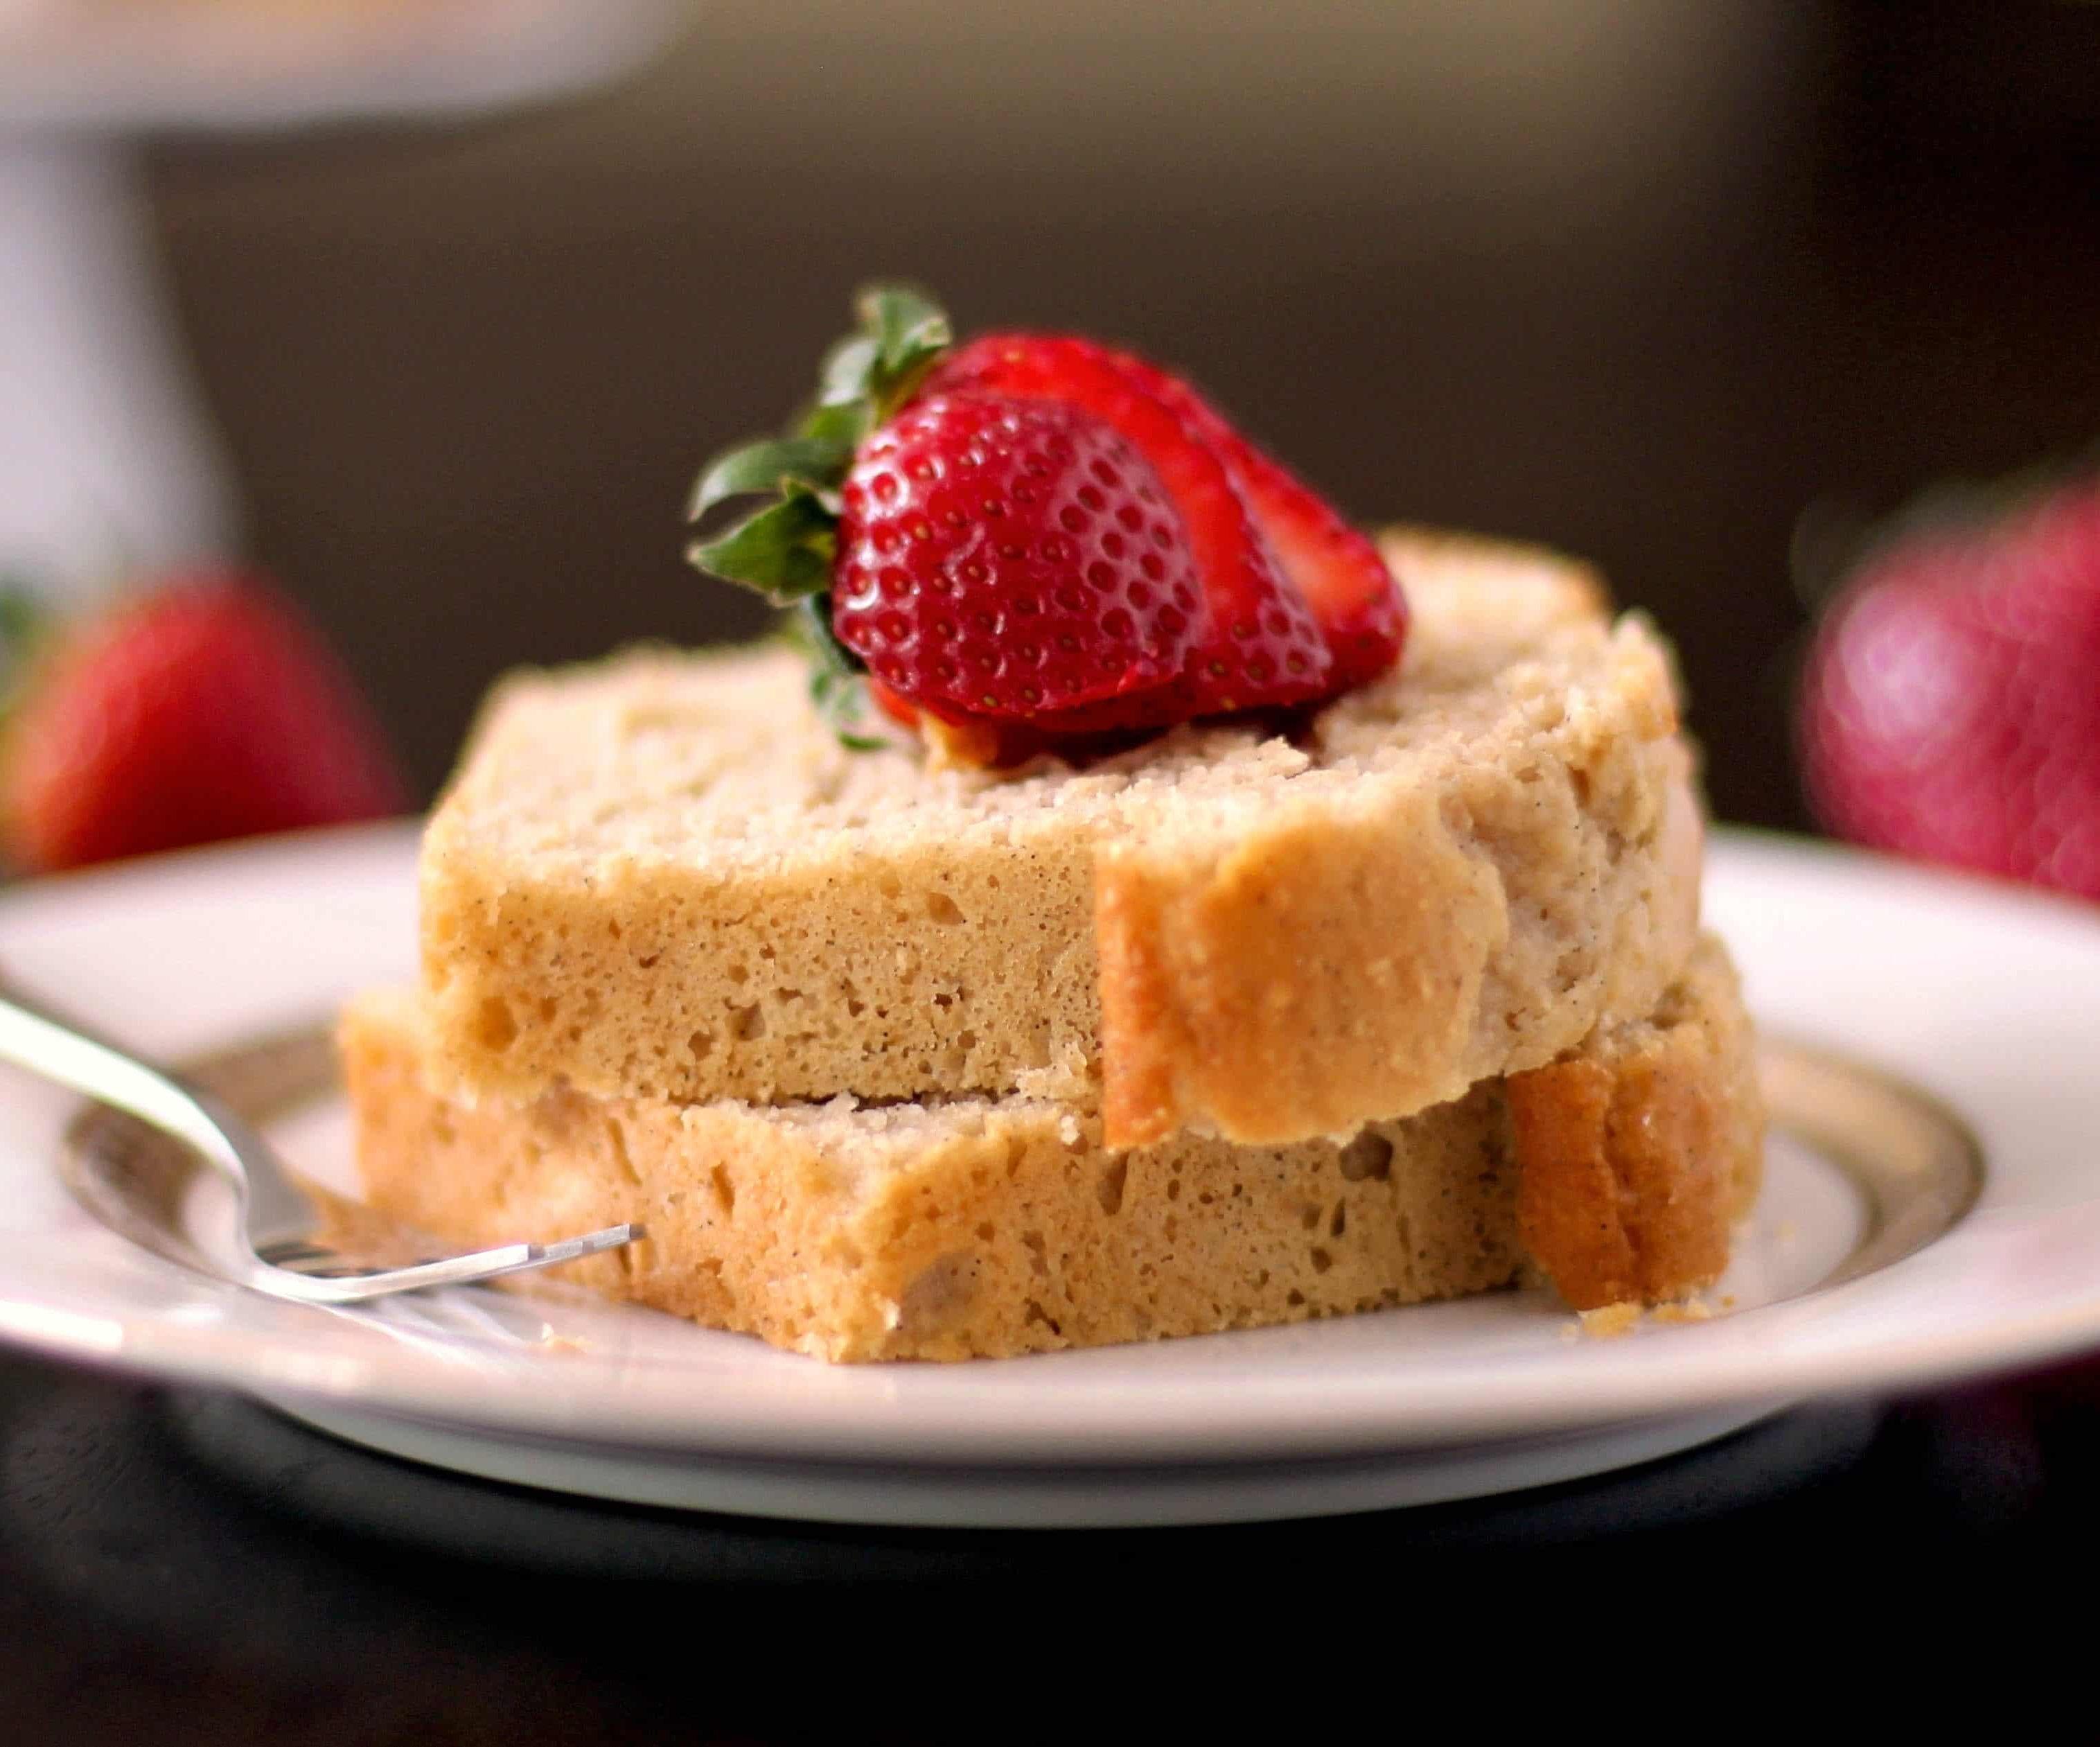 Vanilla Cake Recipe Low Calories: Desserts With Benefits Healthy Whole Wheat Vanilla Bean